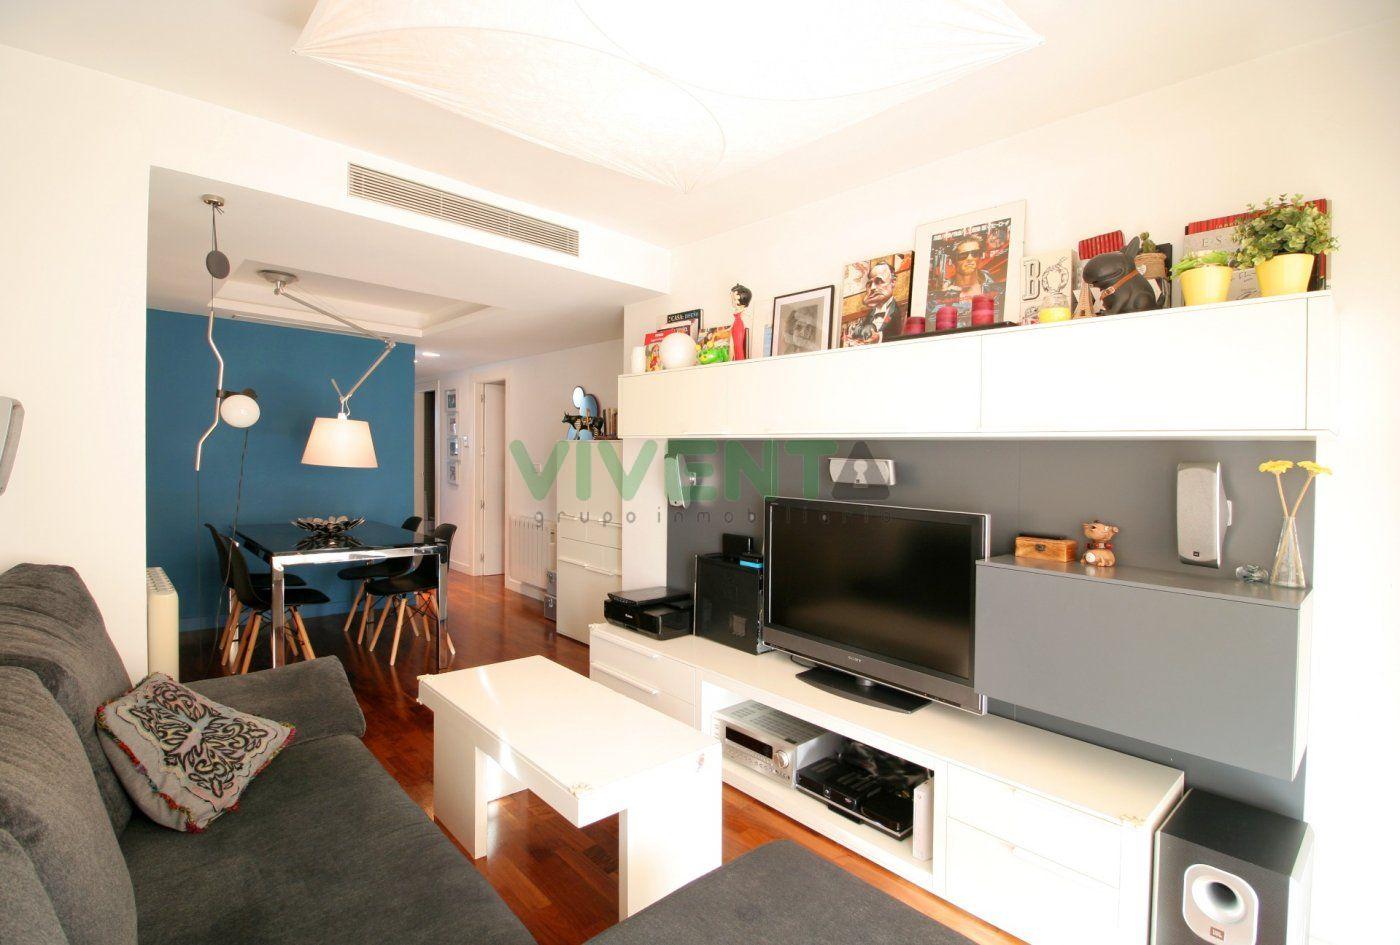 piso en javali-viejo · javali-viejo 105000€